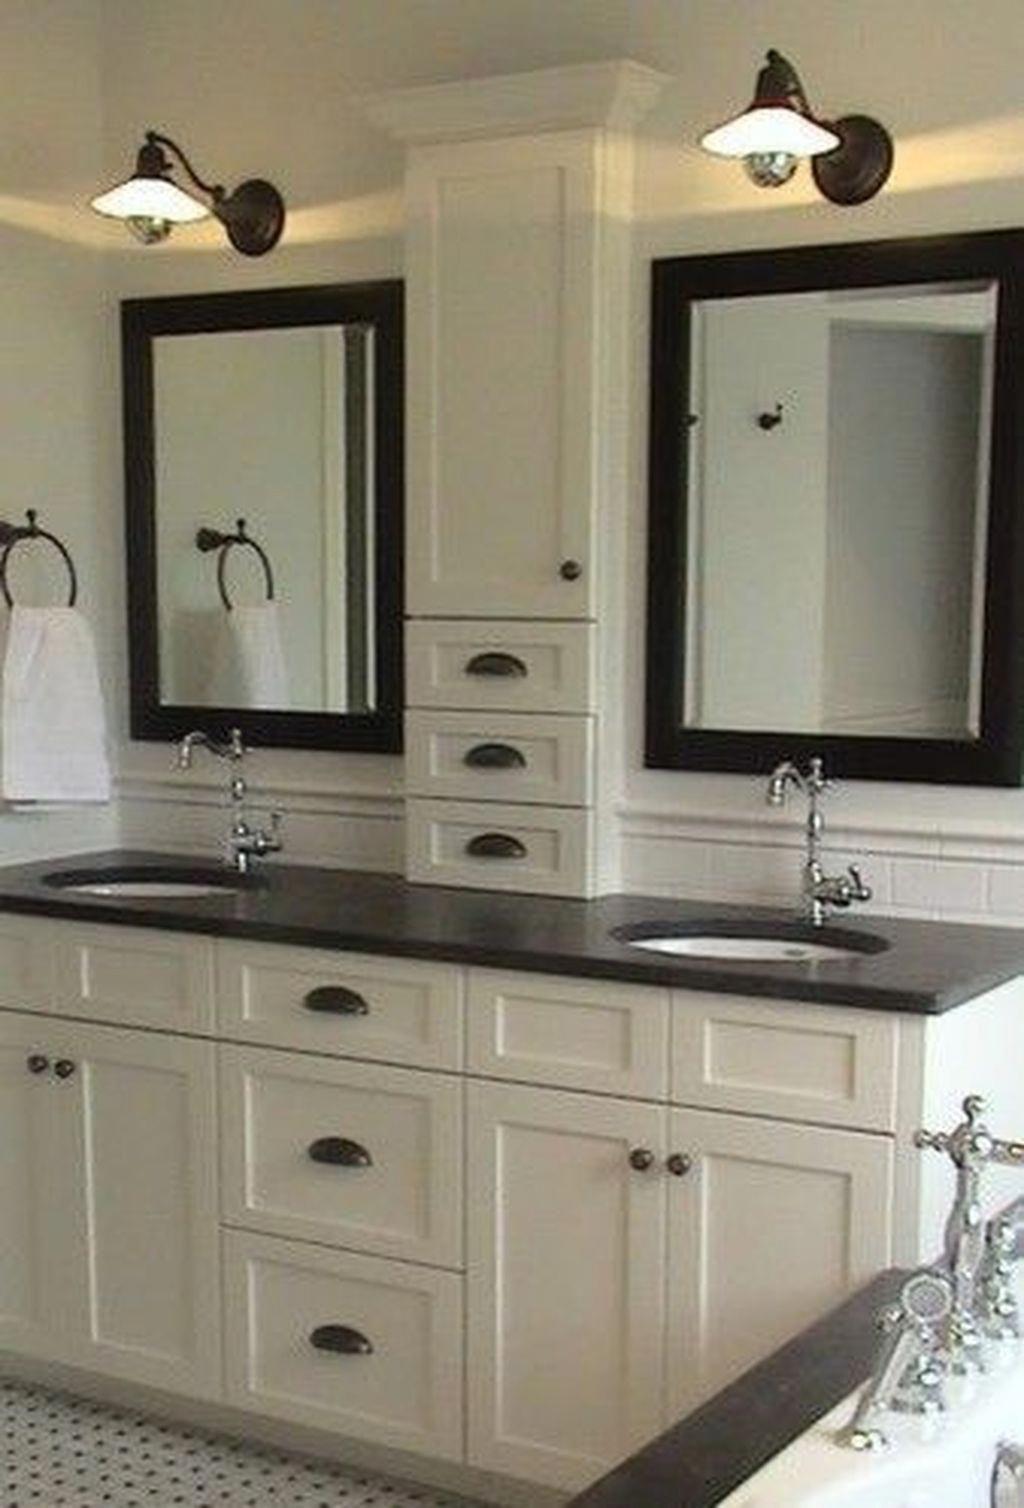 bathroomsinger craft ideas for bathroom walls bathroomlighting rh in pinterest com Quotes for Bathroom Walls Bathroom Wall Color Ideas